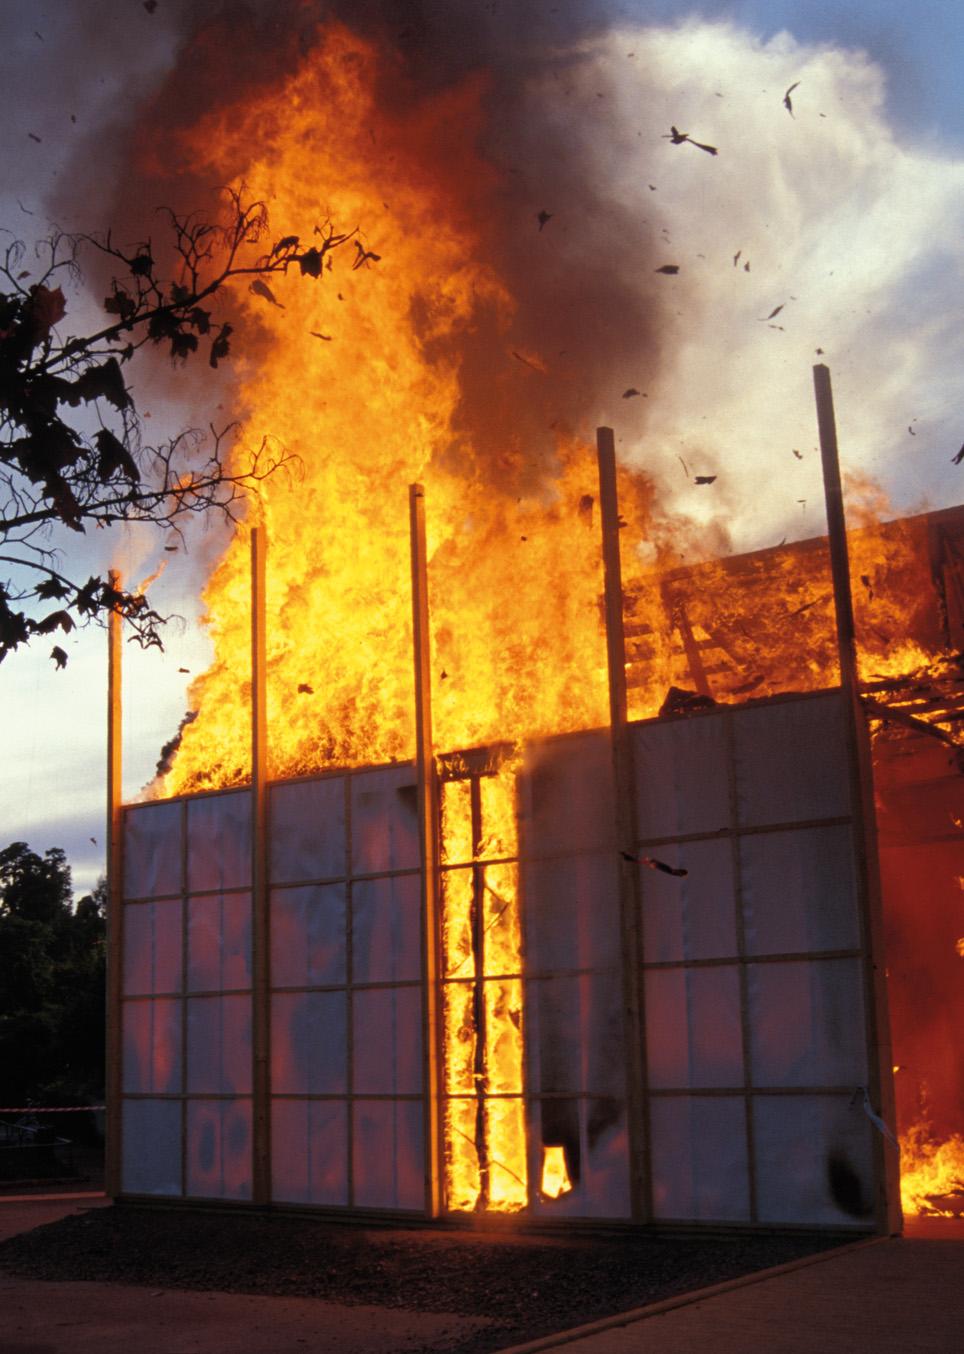 Alfredo Jaar, The Skoghall Konsthall, 2000. Courtesy: Galleria Lia Rumma, Milano